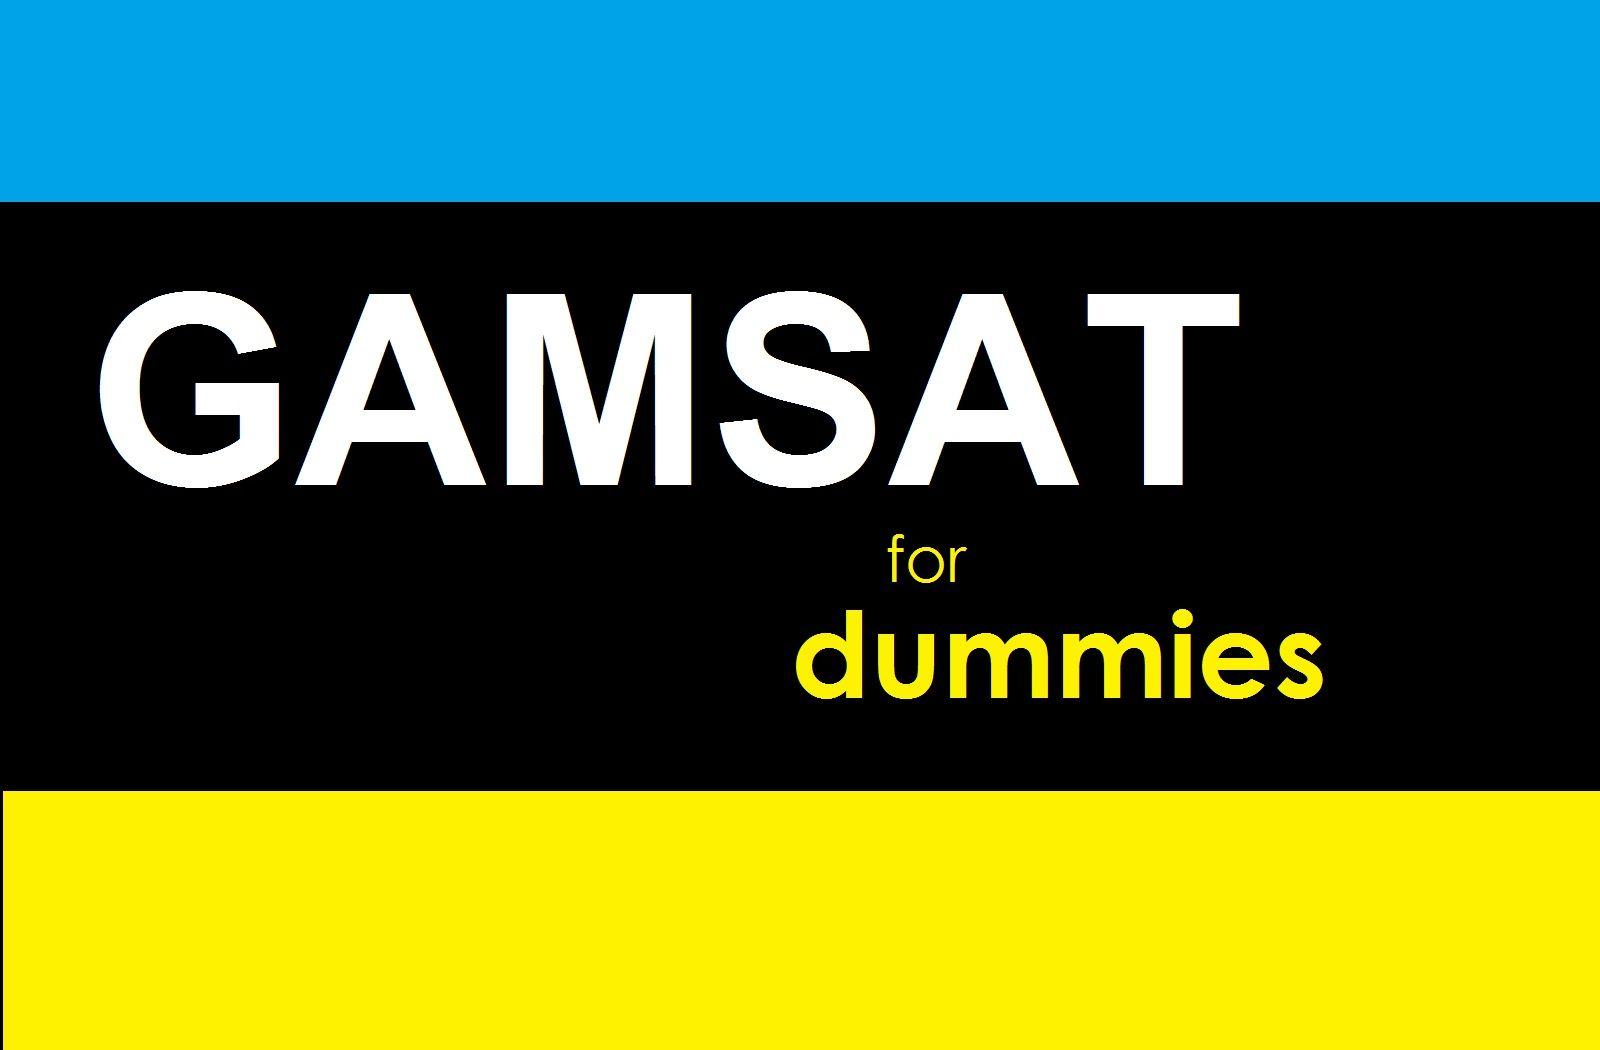 GAMSAT for Dummies